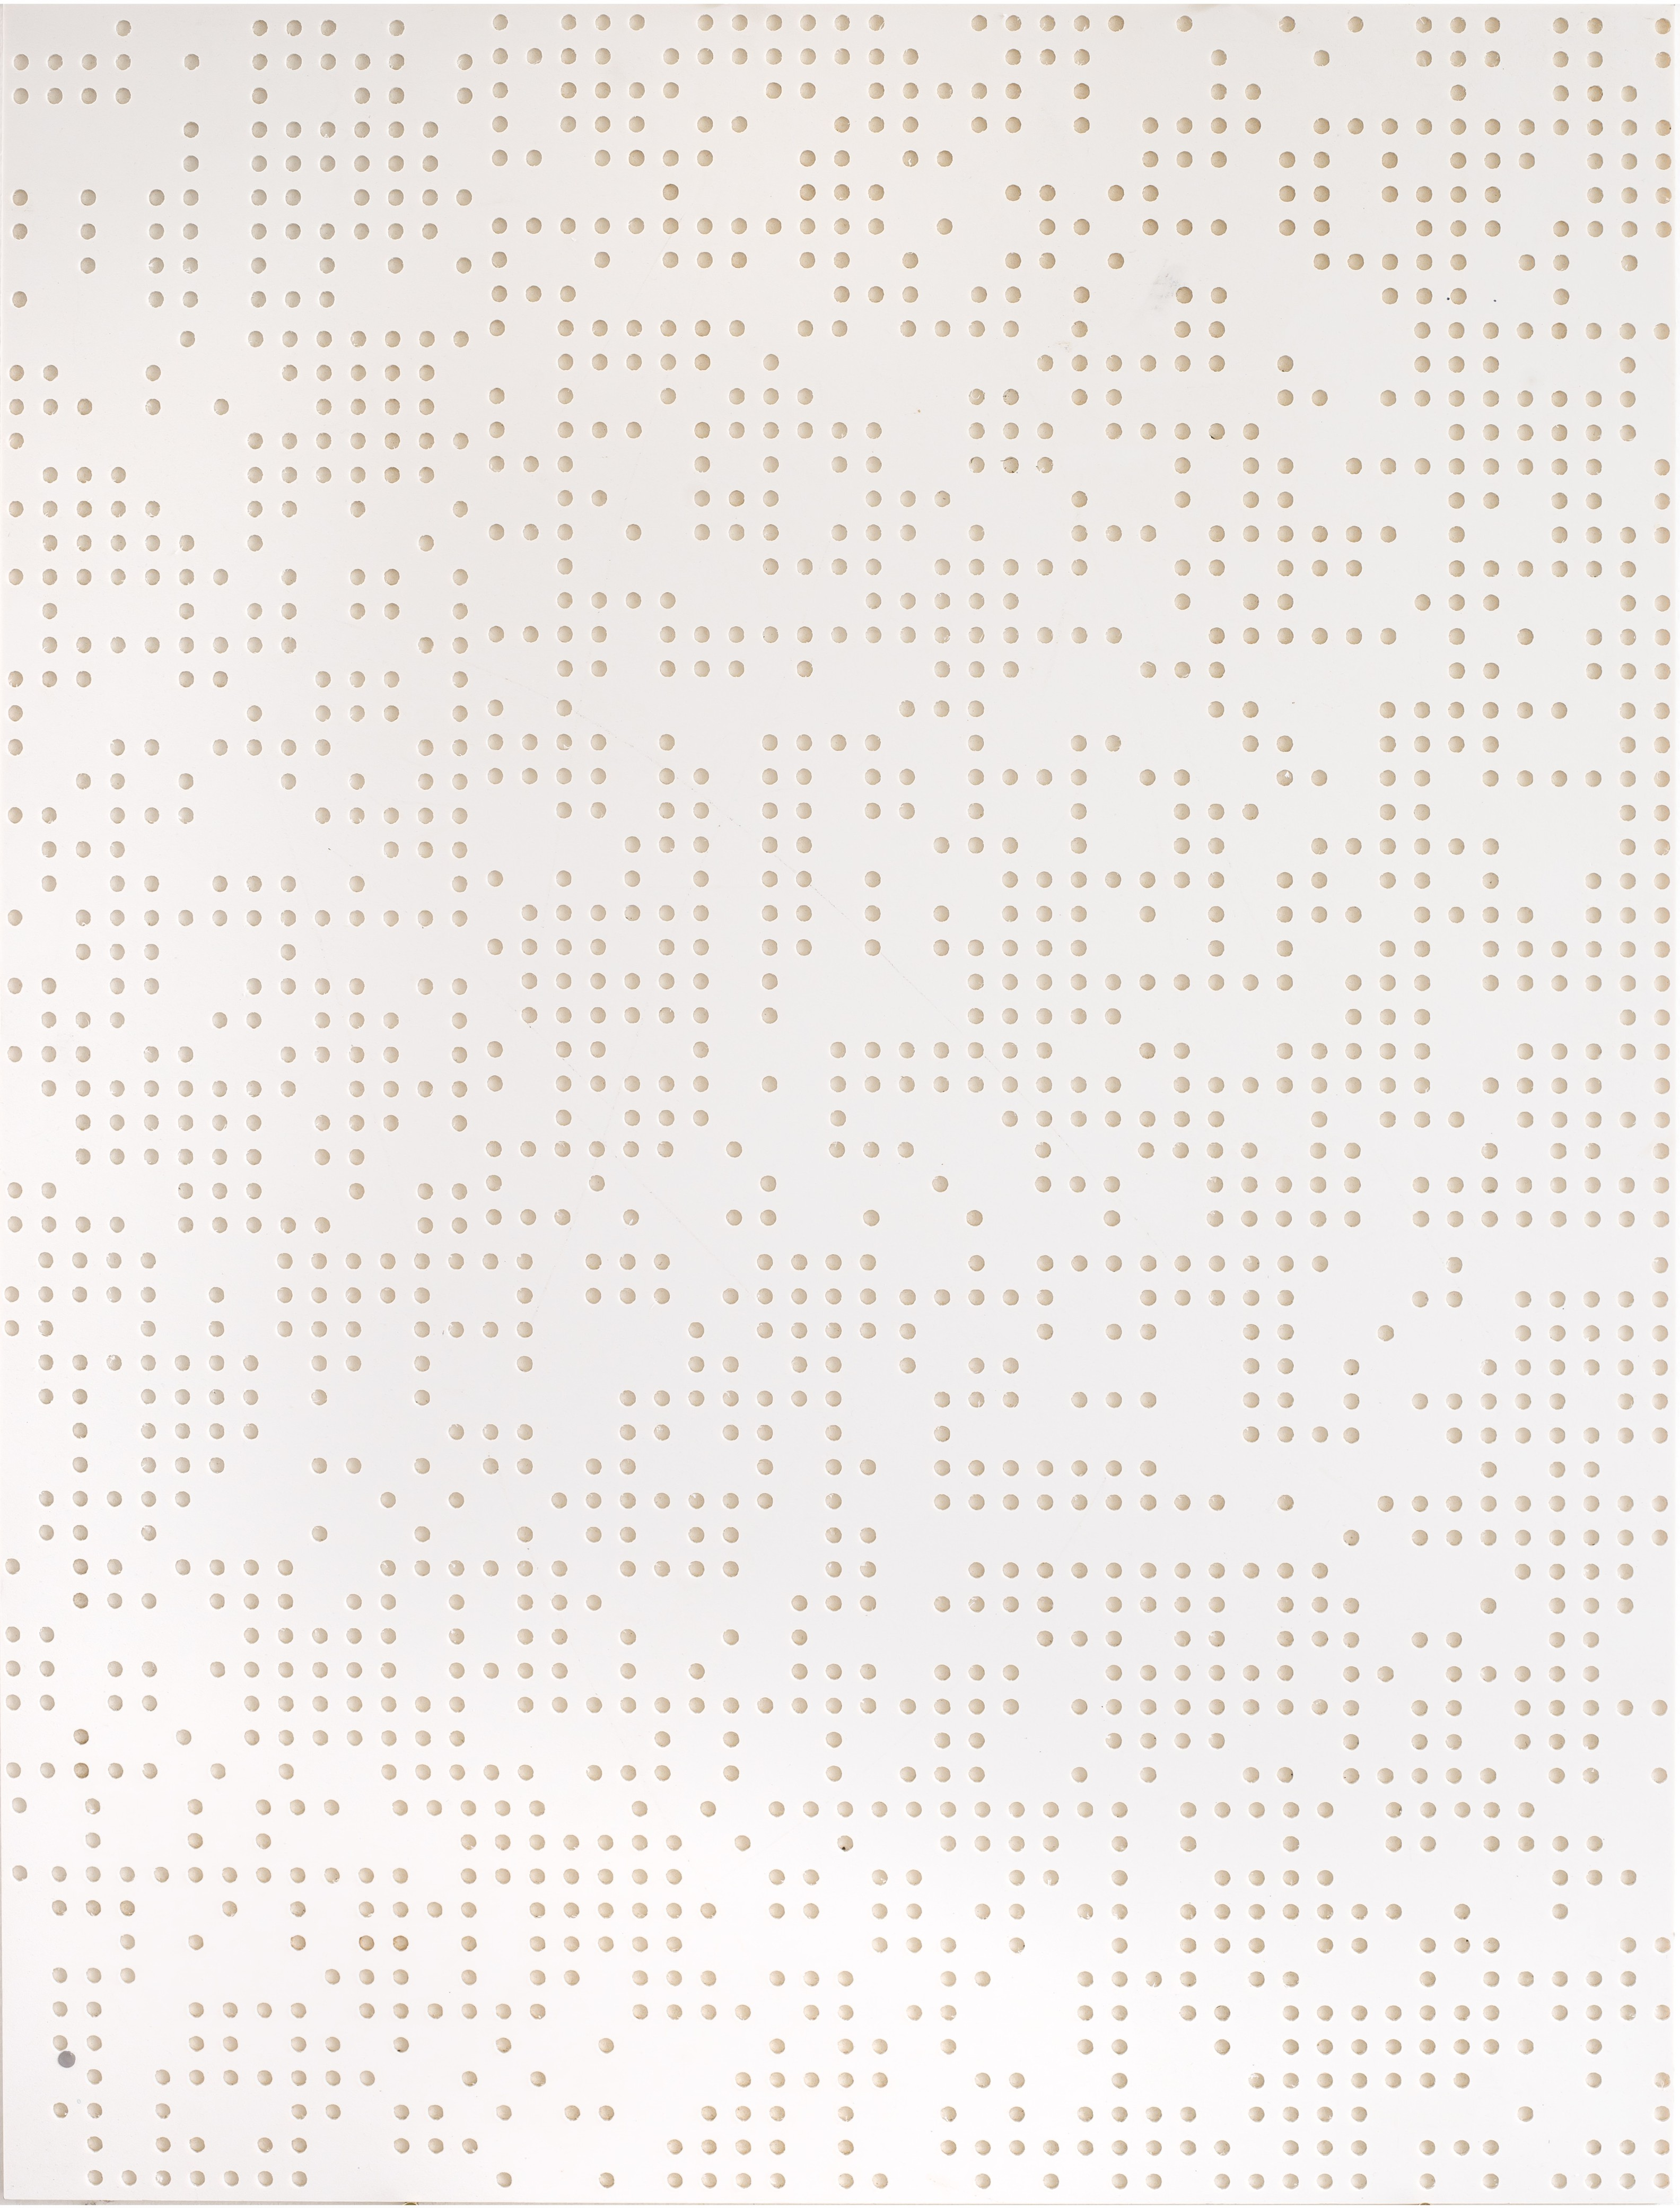 ENCODING 2015, Computer numerical control(CNC) plastic board, 90x68cm,